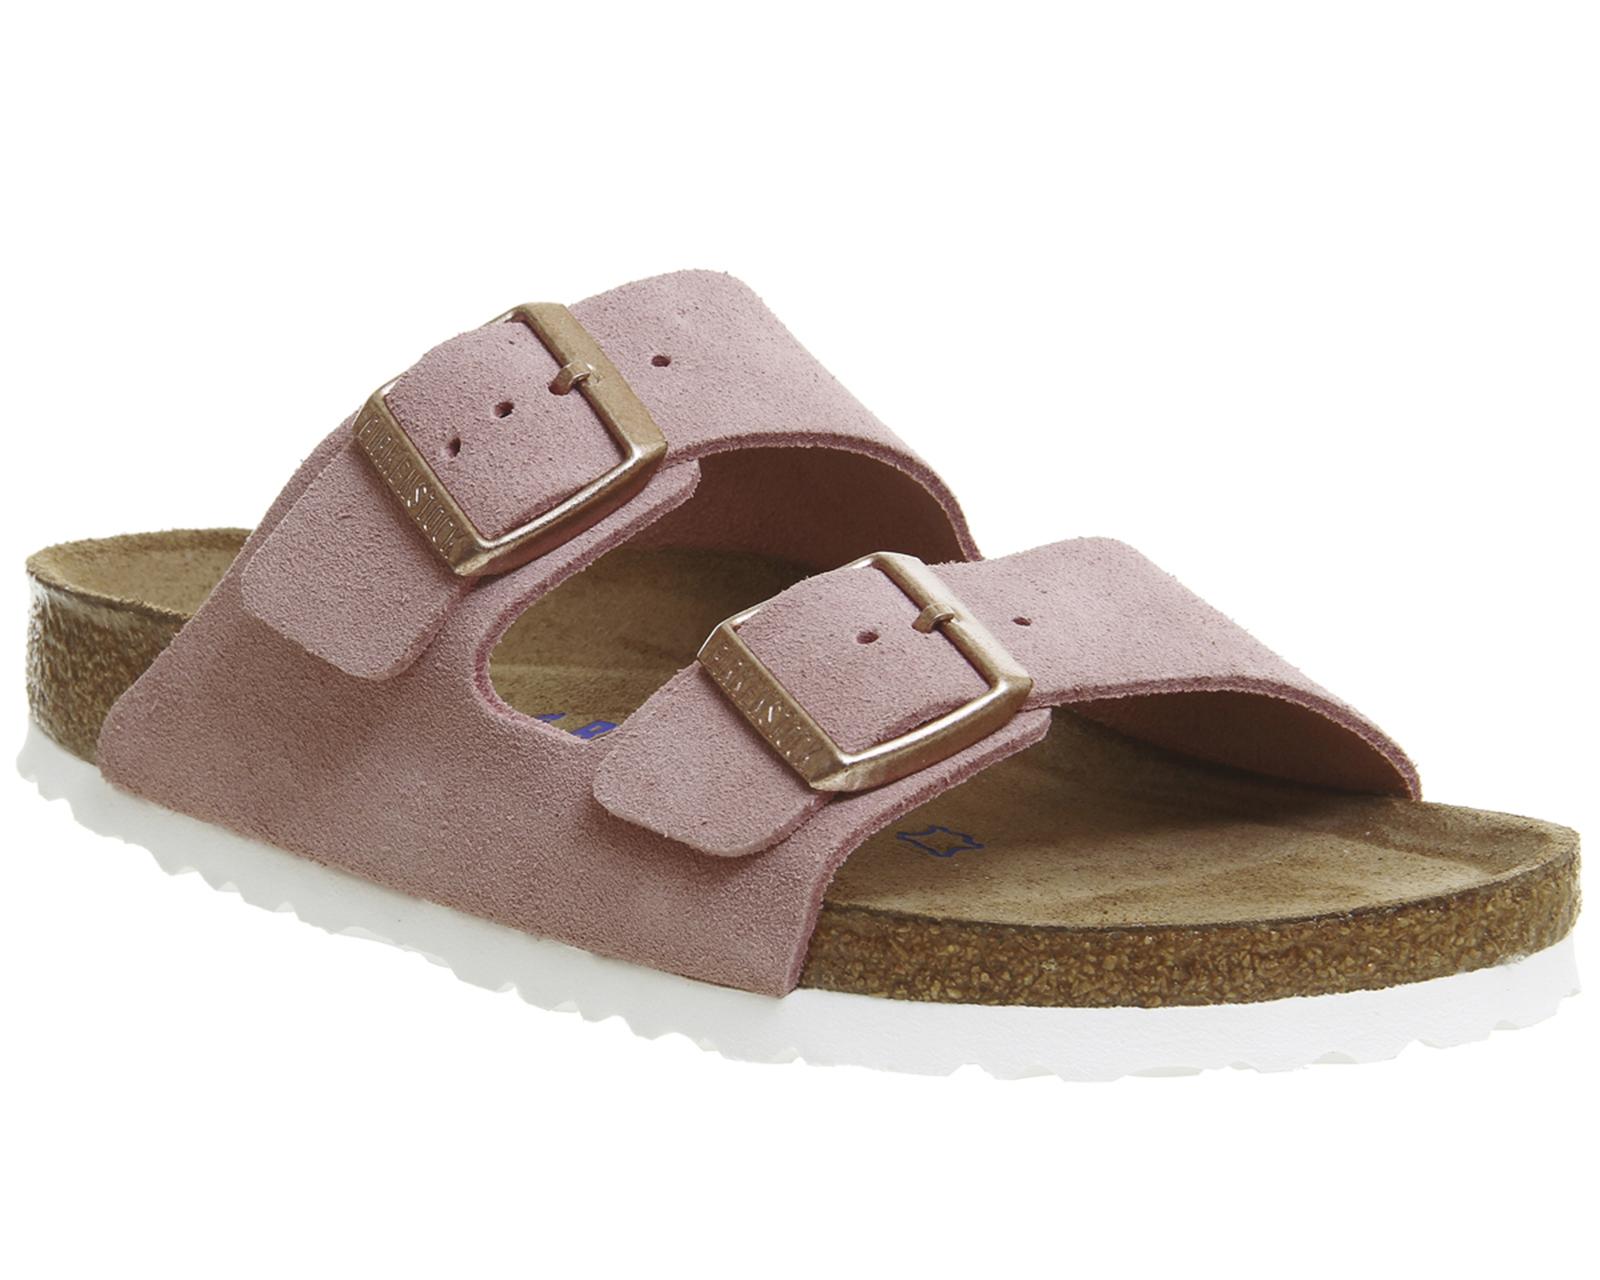 womens birkenstock arizona two strap sandals rose suede. Black Bedroom Furniture Sets. Home Design Ideas